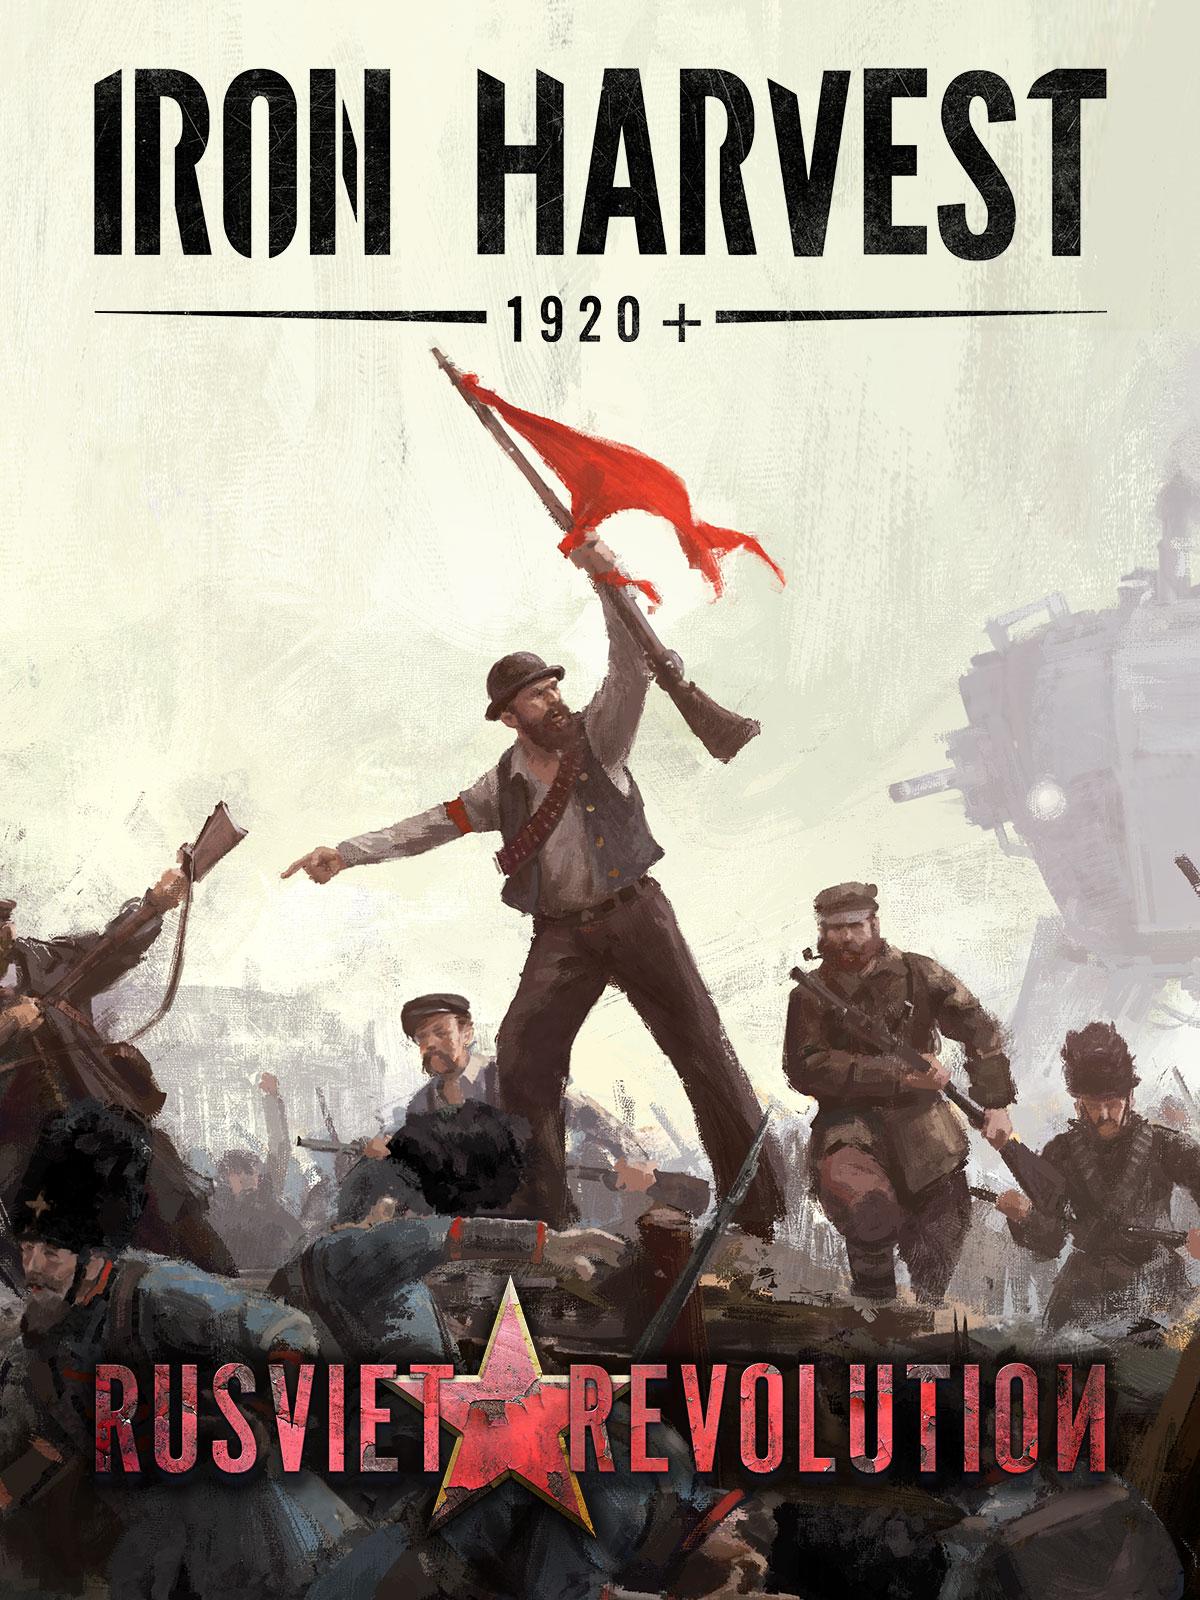 Iron Harvest - Rusviet Revolution (DLC)